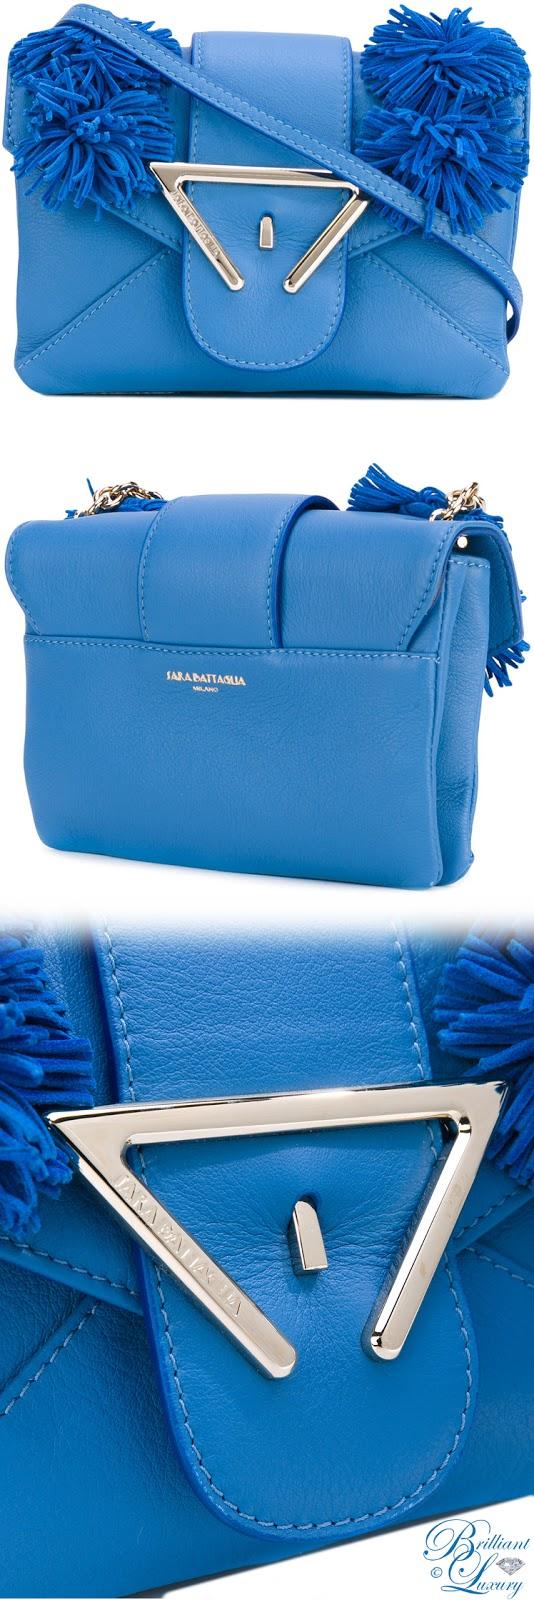 Brilliant Luxury ♦ Sara Battaglia Roxy Crossbody Bag